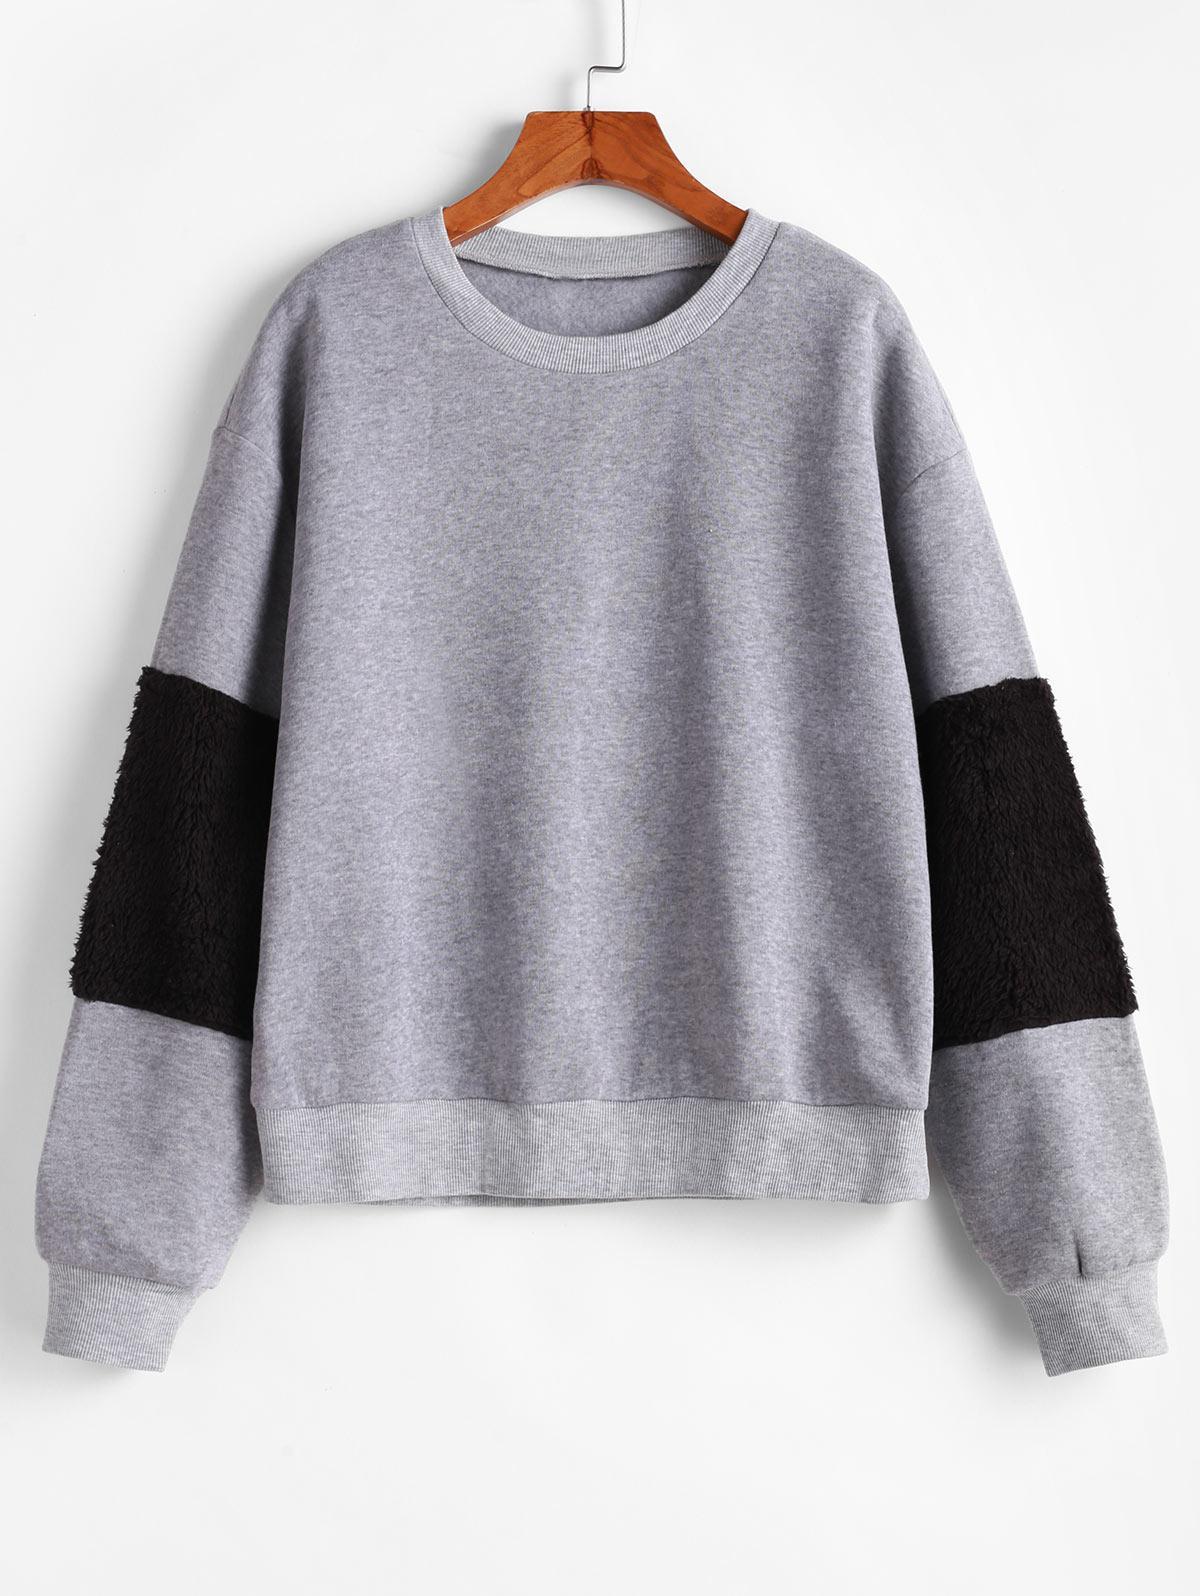 ZAFUL Flocking Fluffy Sleeve Two Tone Drop Shoulder Sweatshirt фото